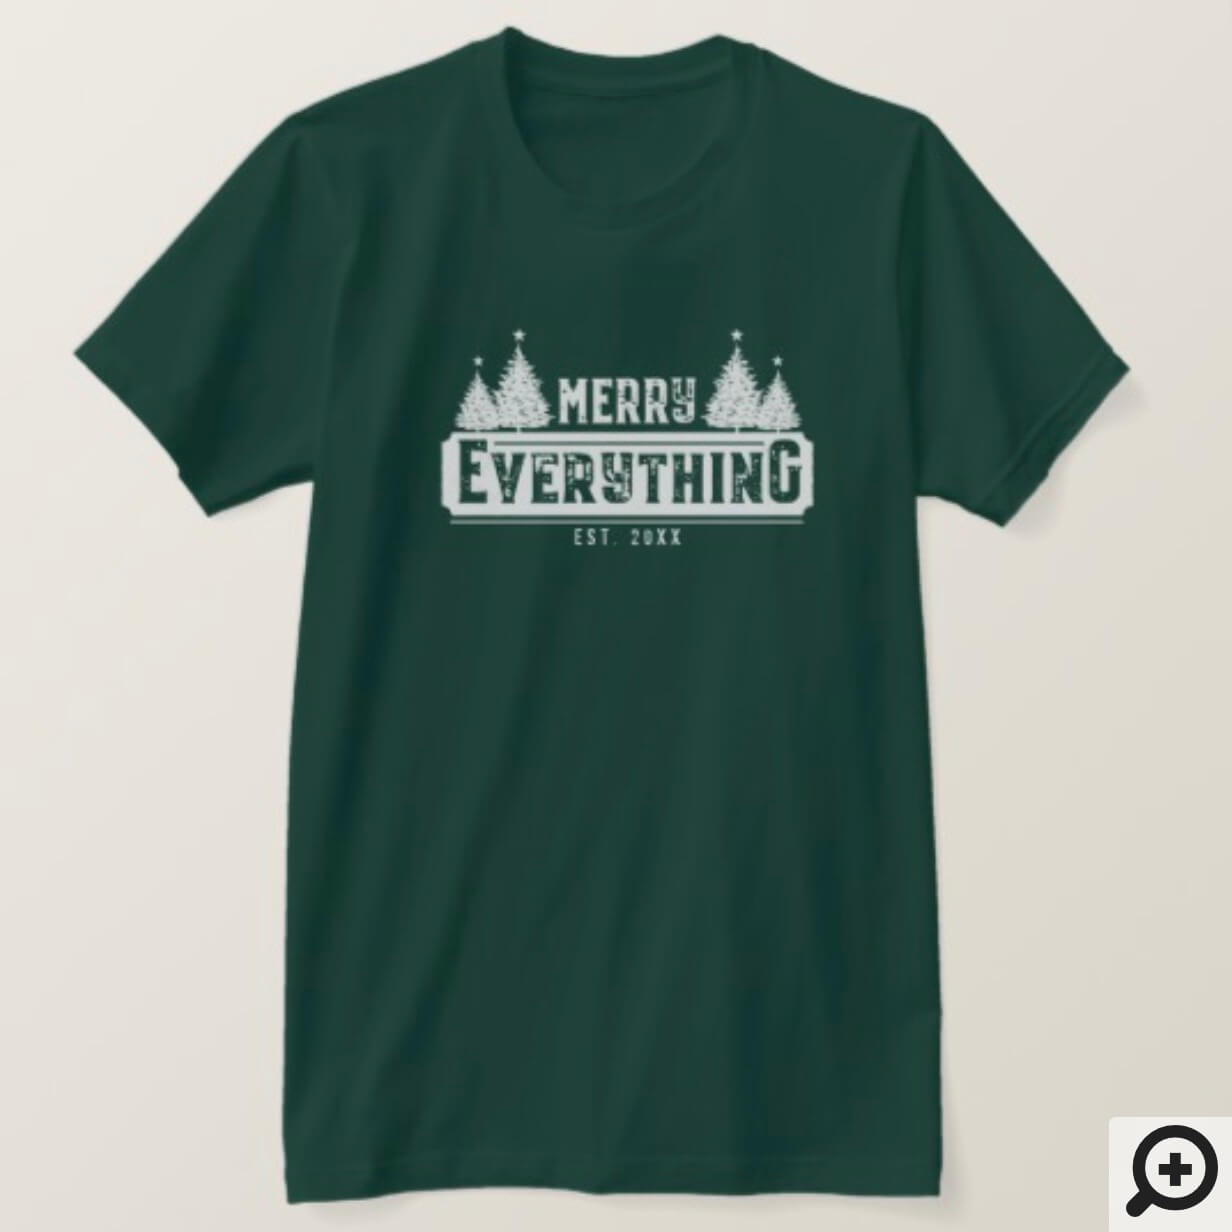 Merry Everything | White Vintage Christmas Tree T-Shirt